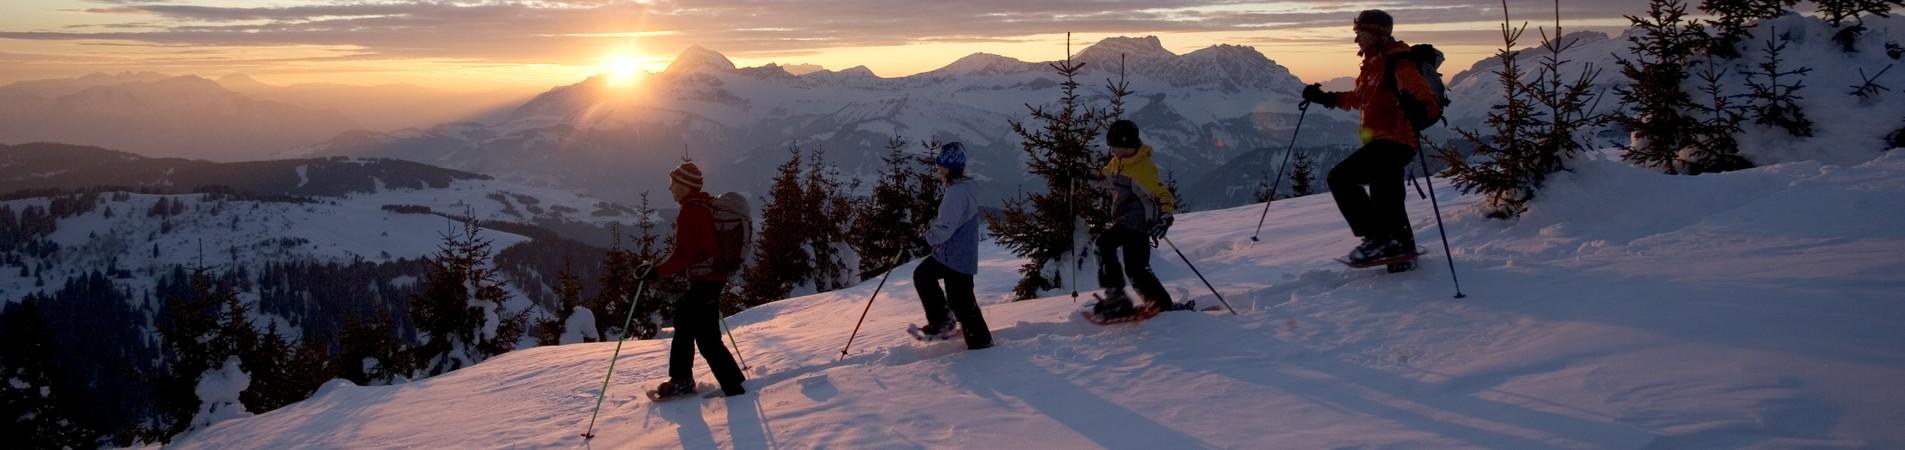 kruis belag ski